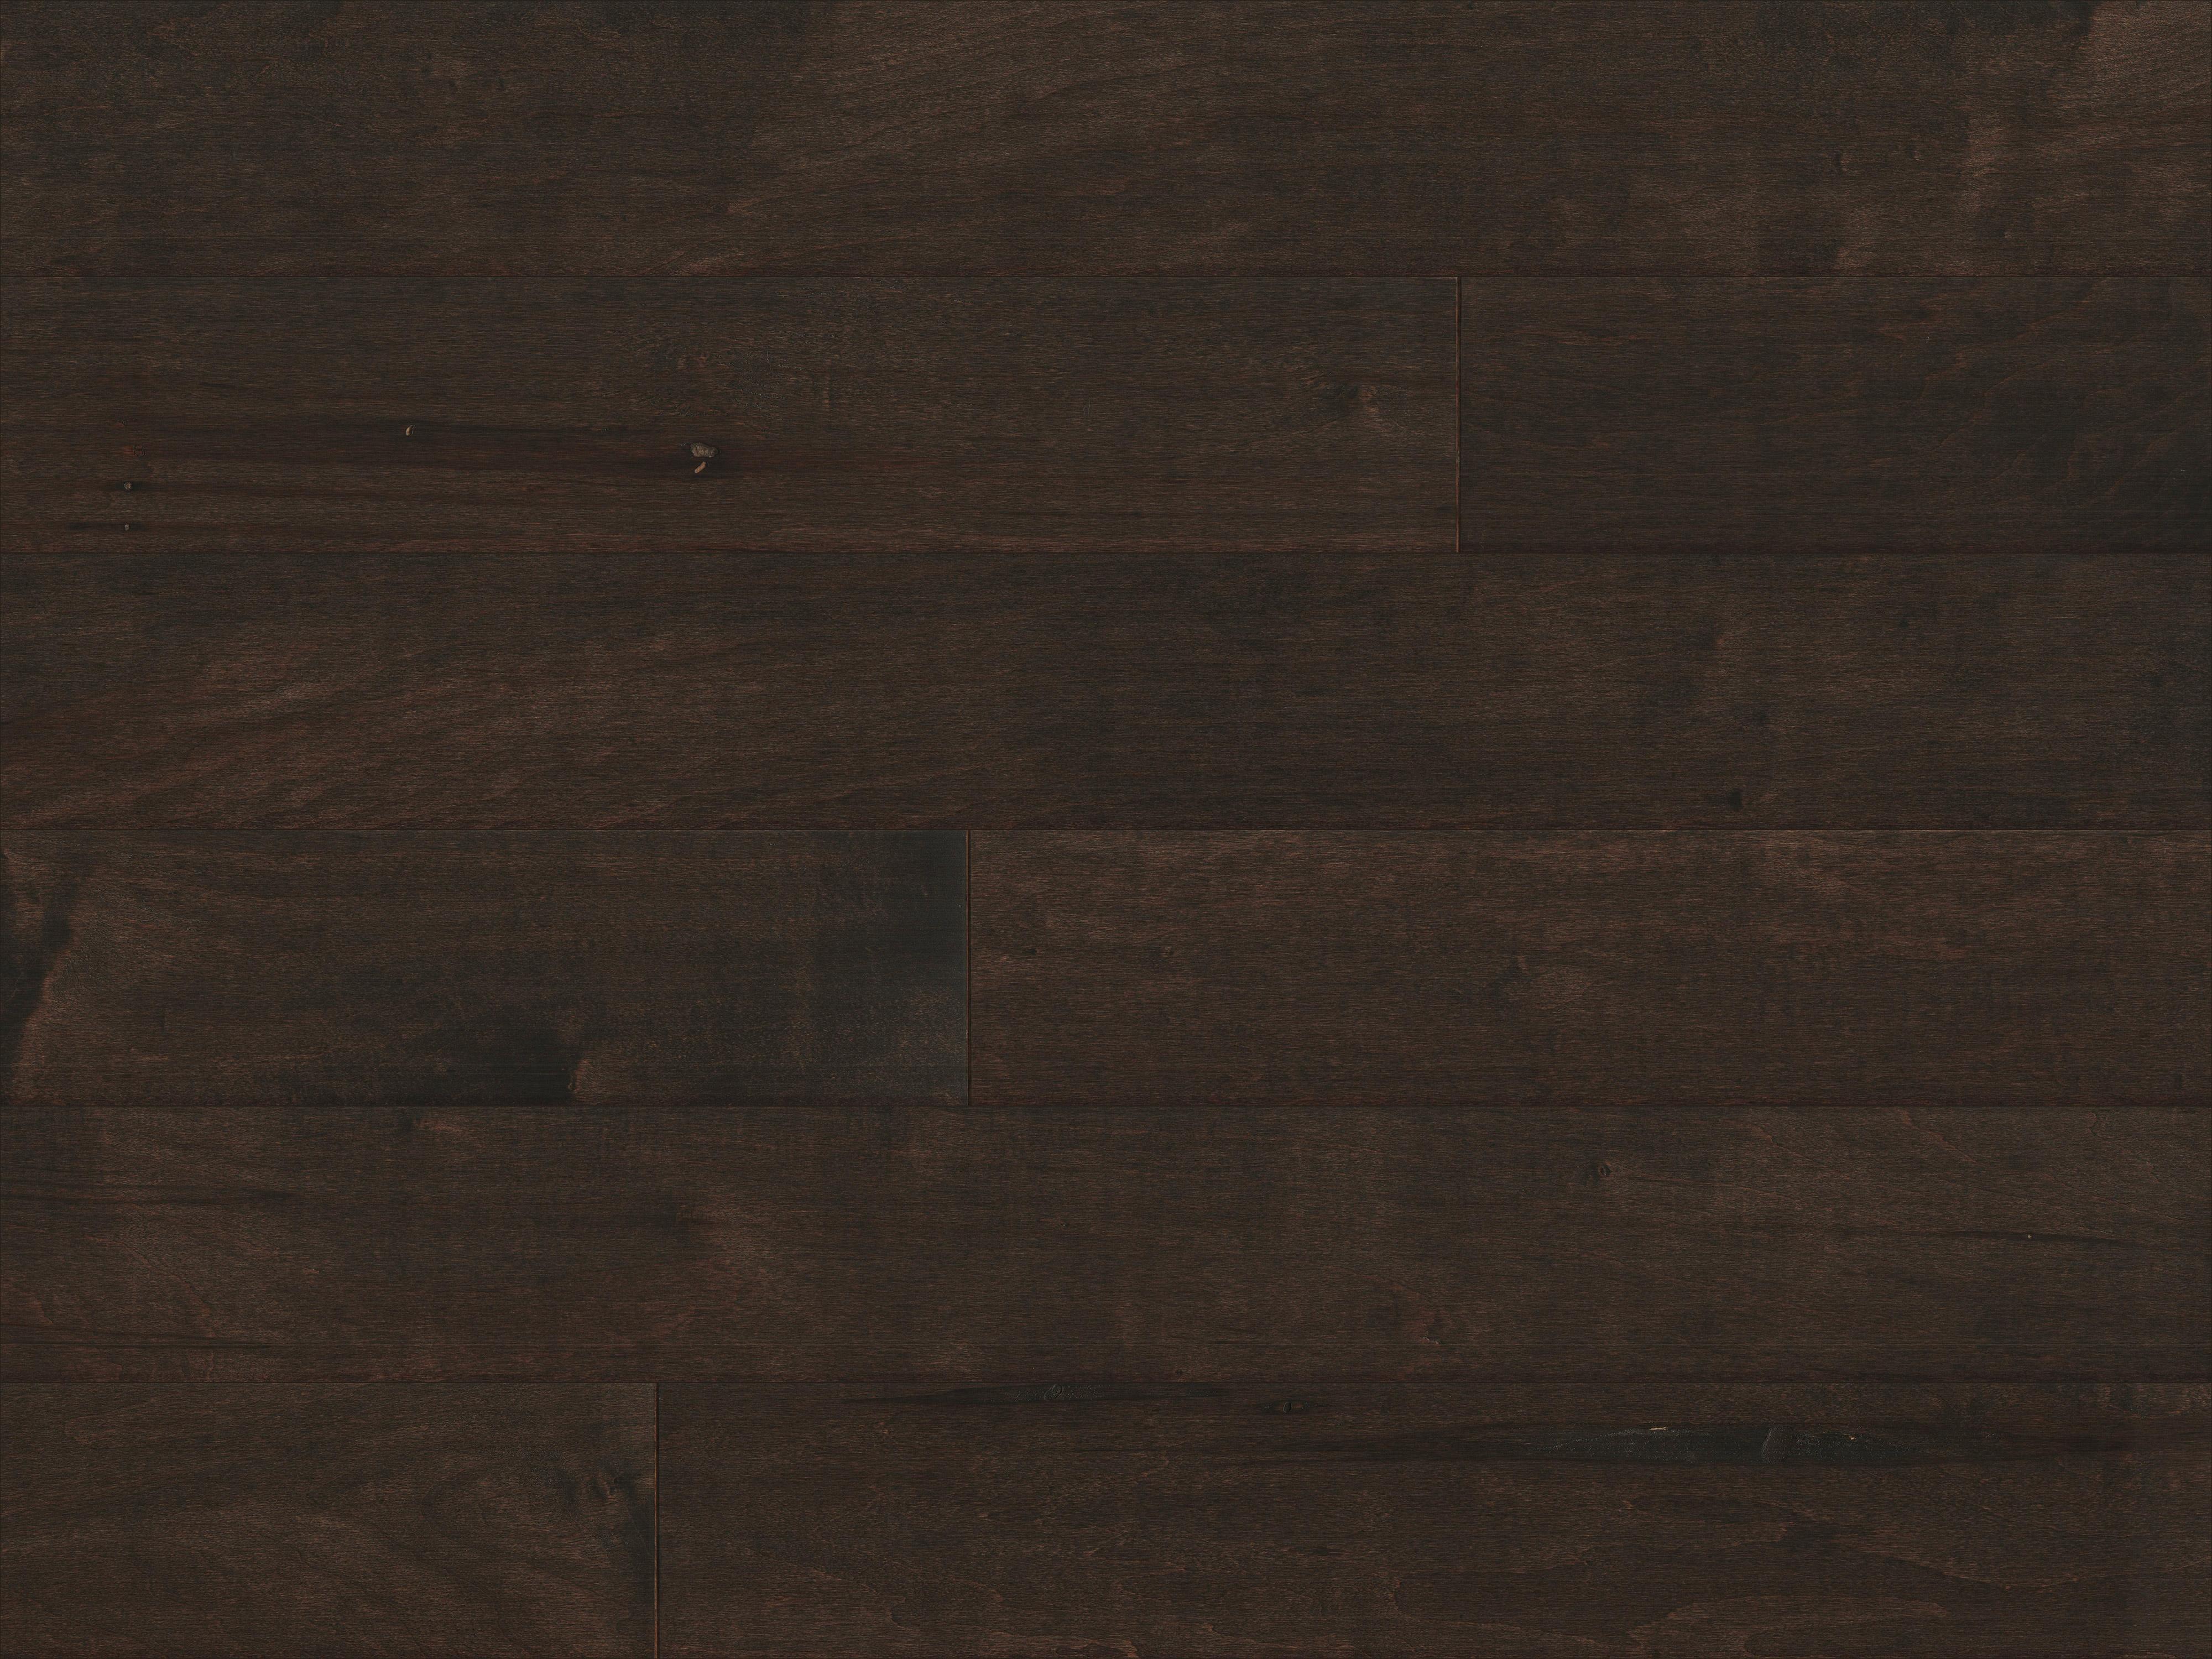 shaw white oak hardwood flooring of mullican ridgecrest maple cappuccino 1 2 thick 5 wide engineered inside mullican ridgecrest maple cappuccino 1 2 thick 5 wide engineered hardwood flooring